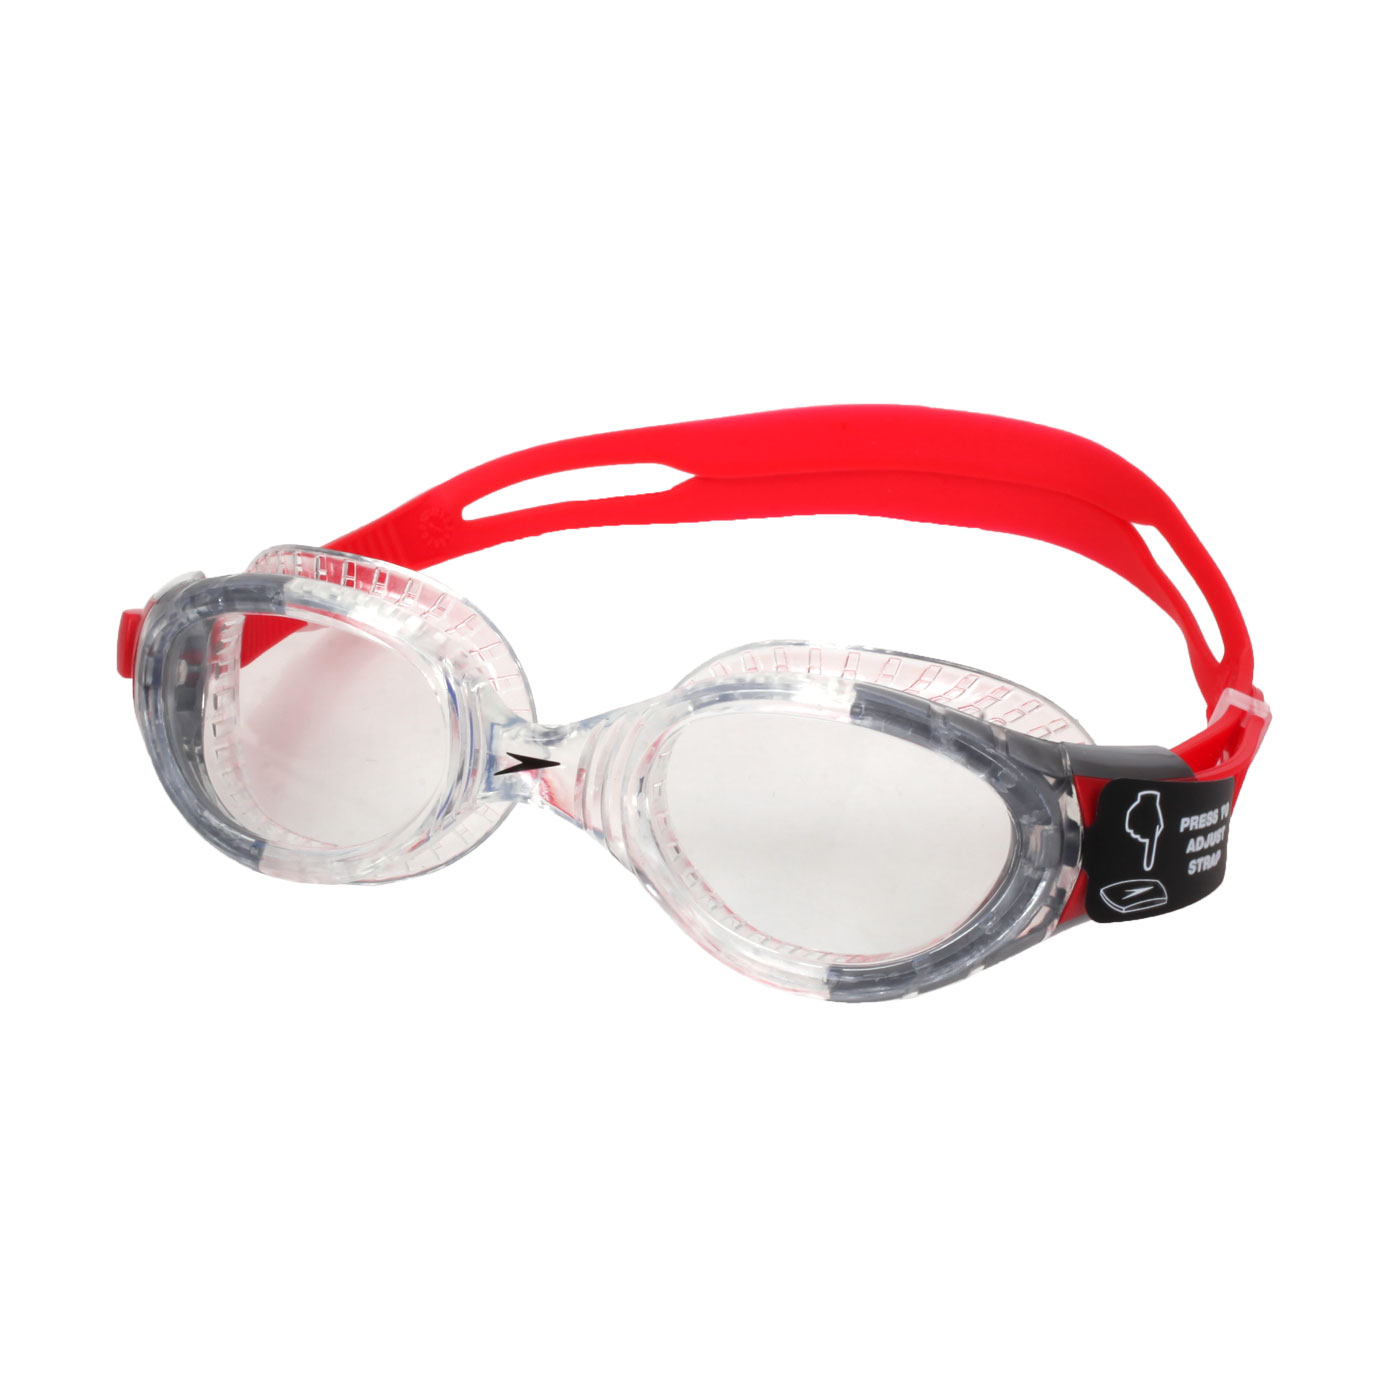 SPEEDO 成人運動泳鏡 Futura Biofuse SD811313B991N - 透明紅黑